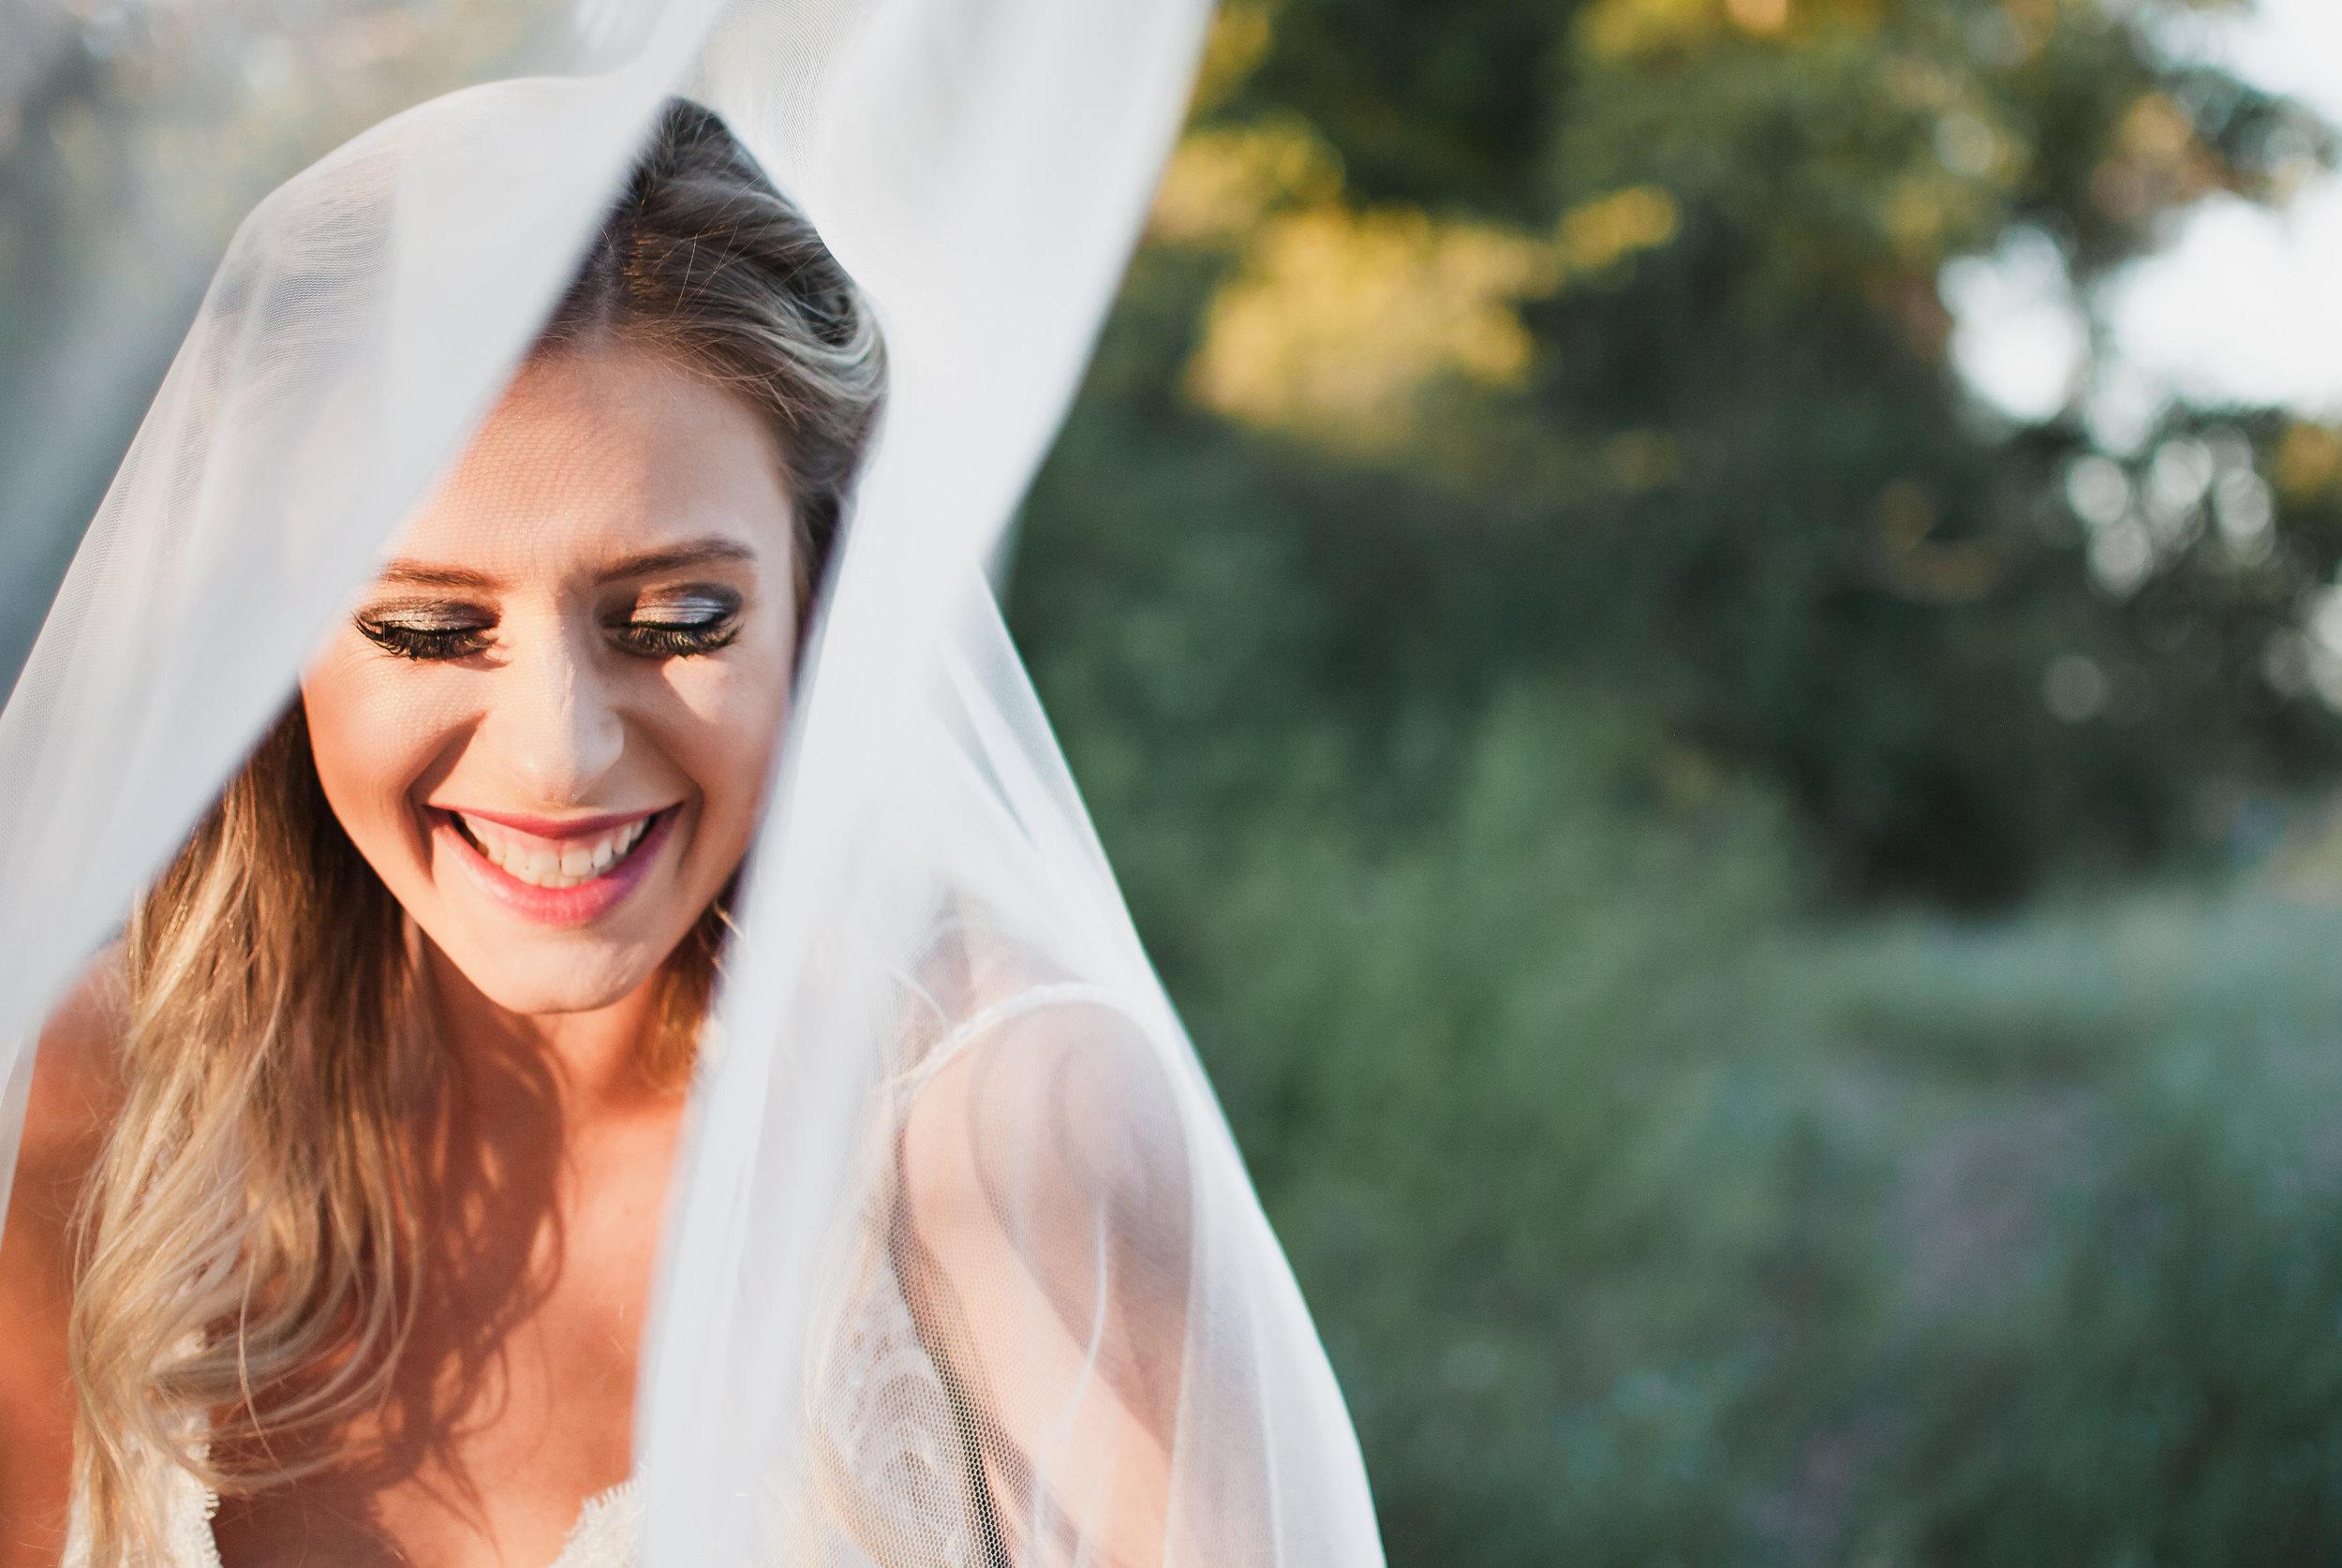 wedding dress styled shoot upriver spokane veil